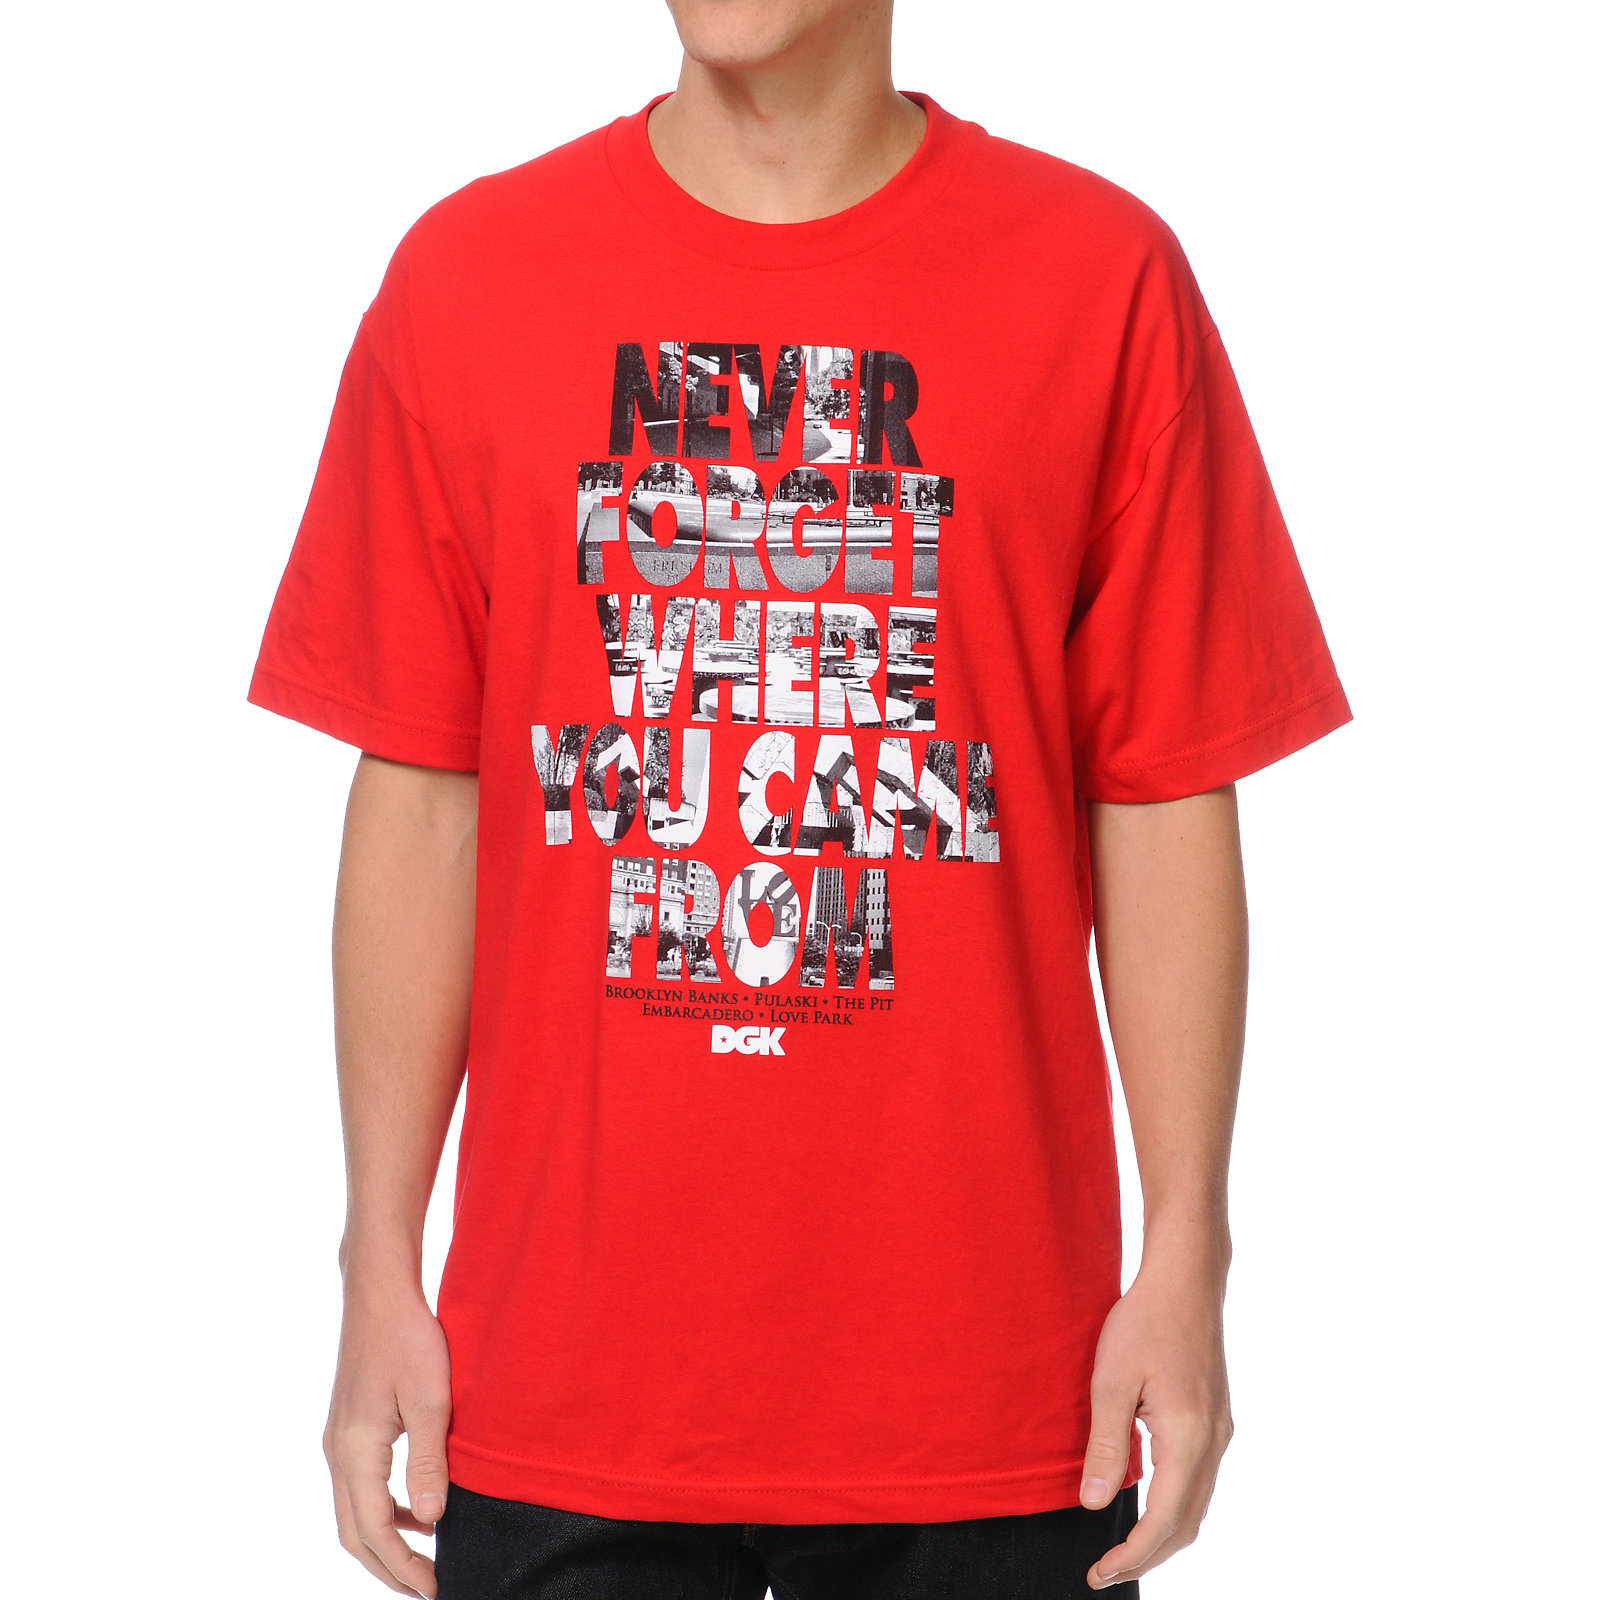 Australia t shirt australia t shirt products for T shirt suppliers wholesale